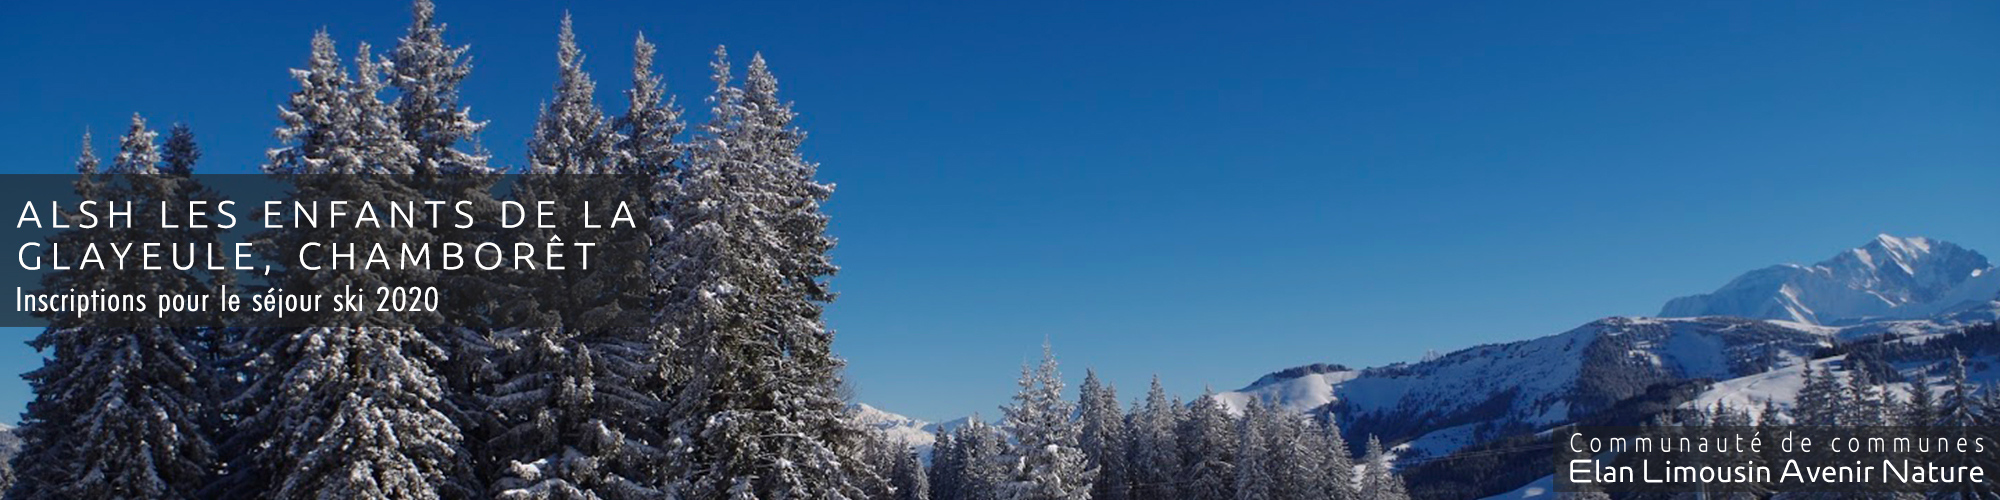 Séjour ski 2020 ALSH Chamborêt